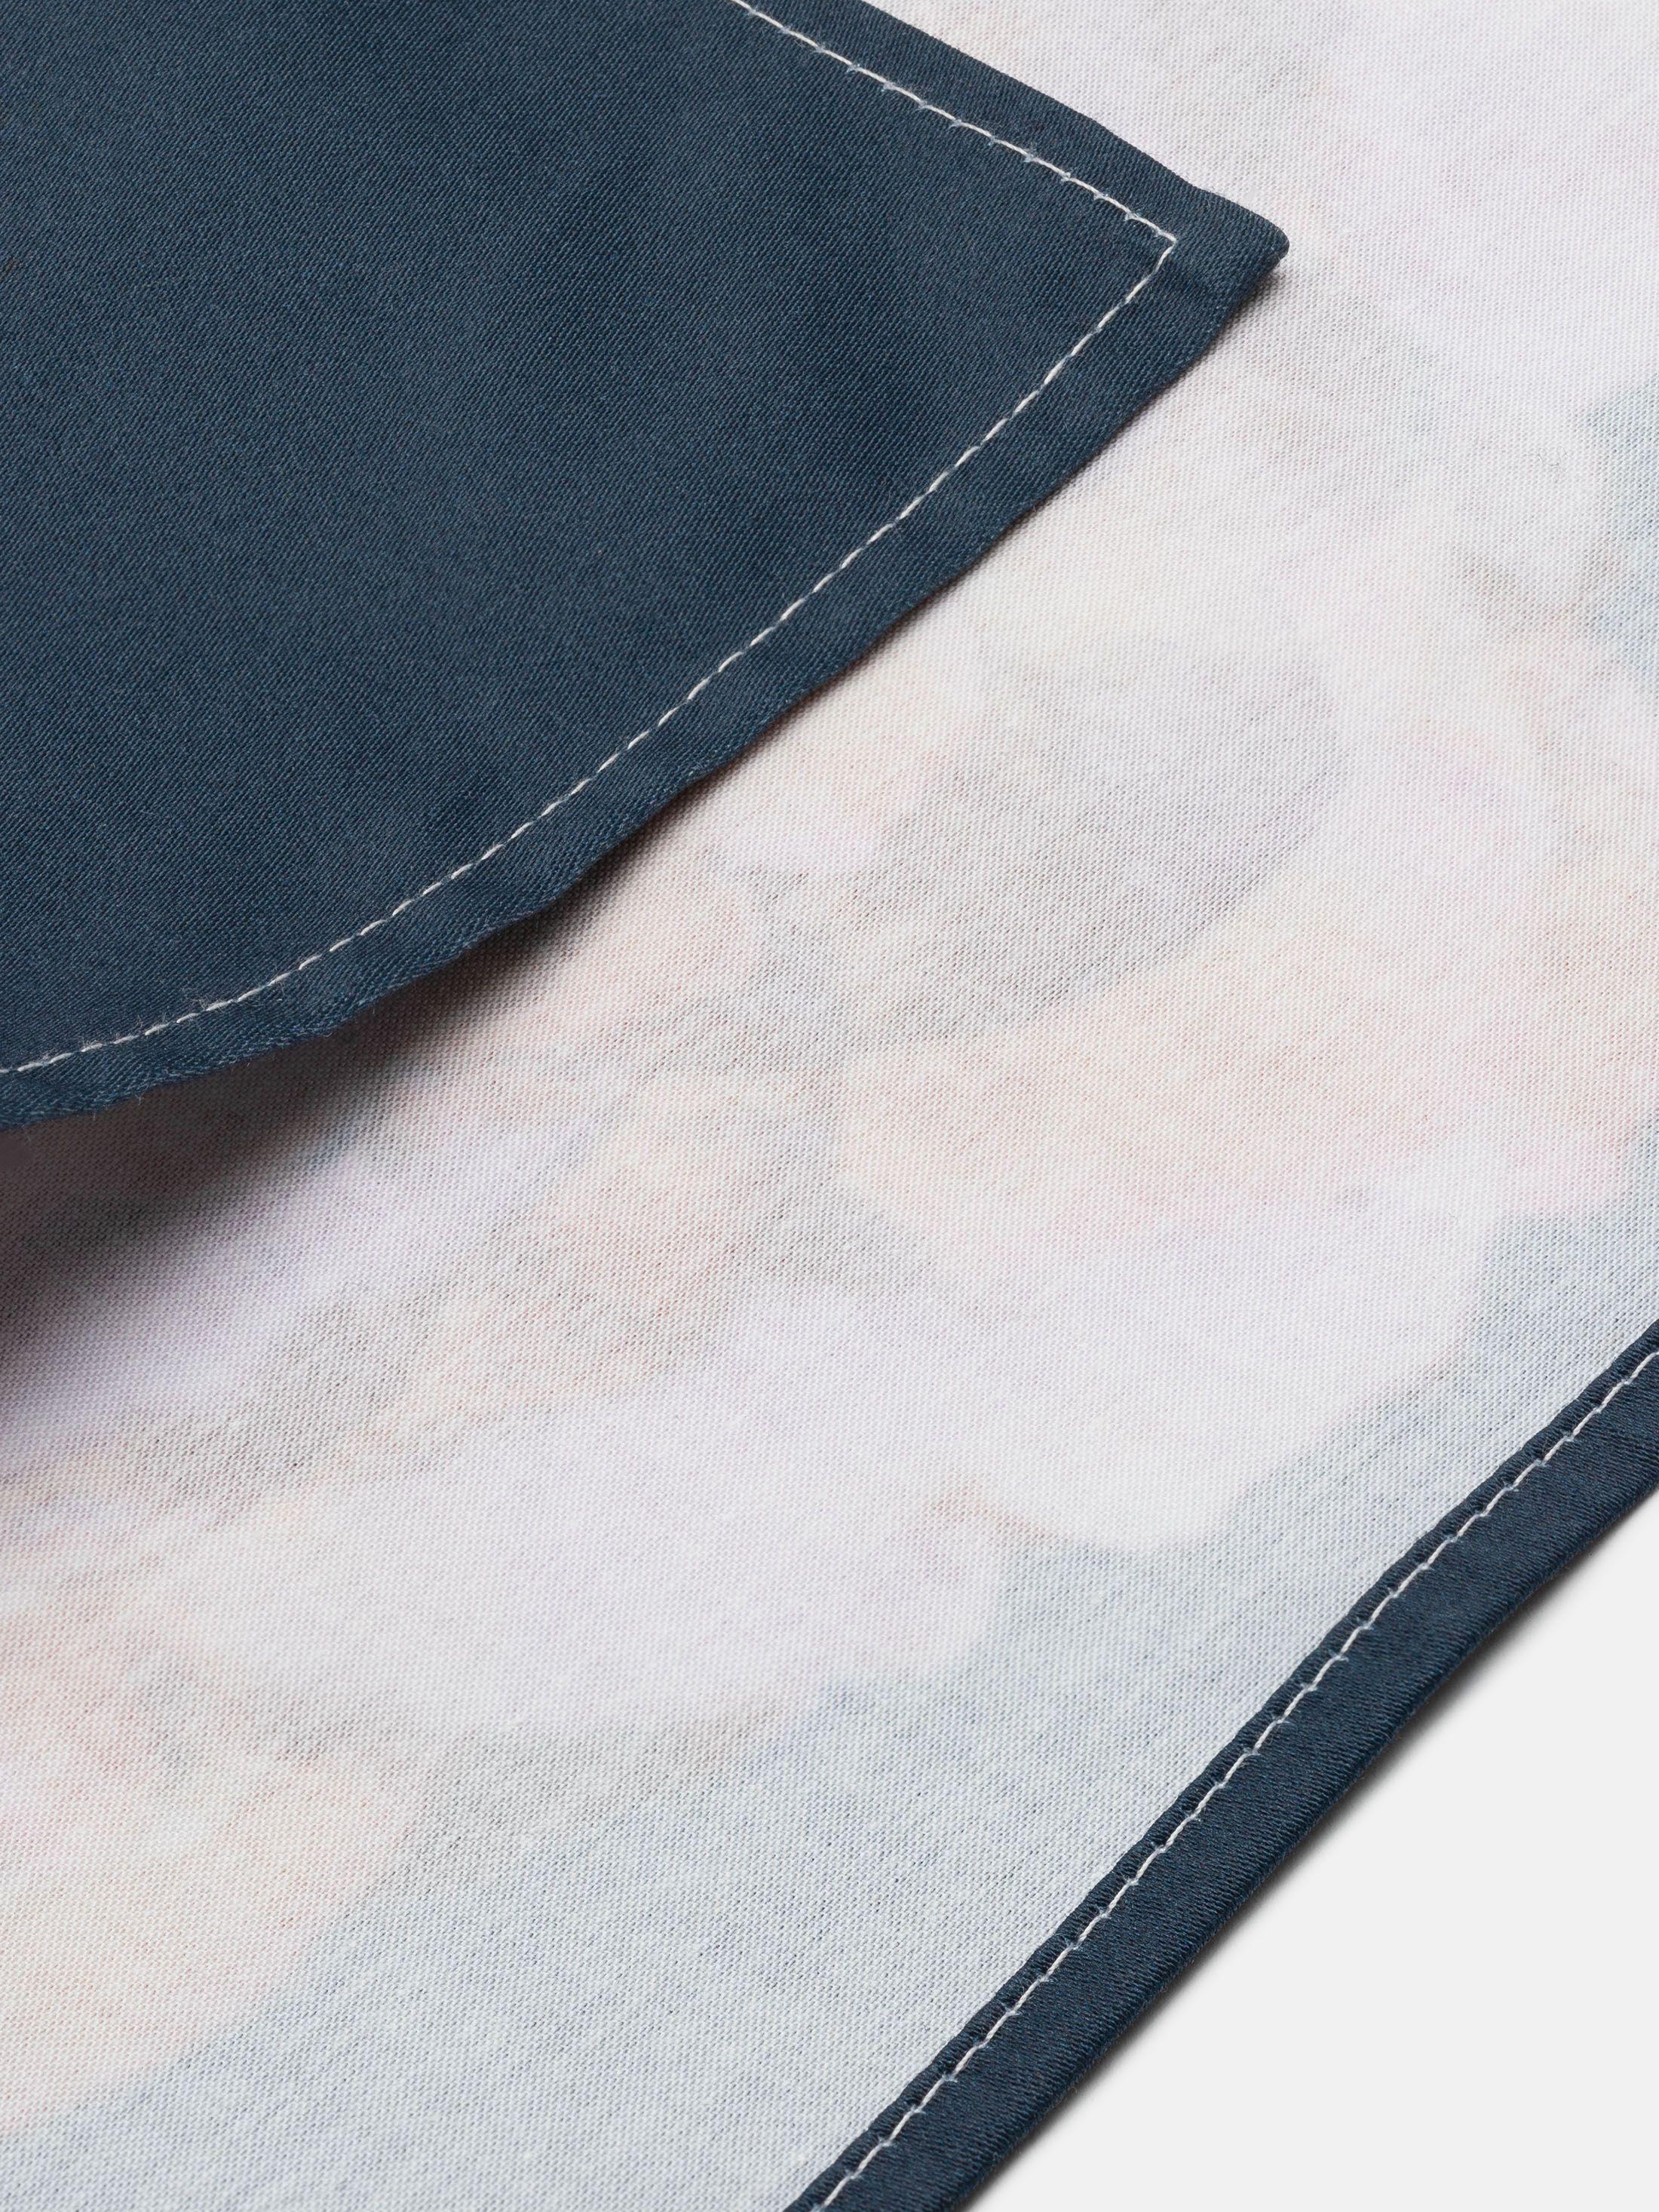 Verso su mouchoir imprimé avec design